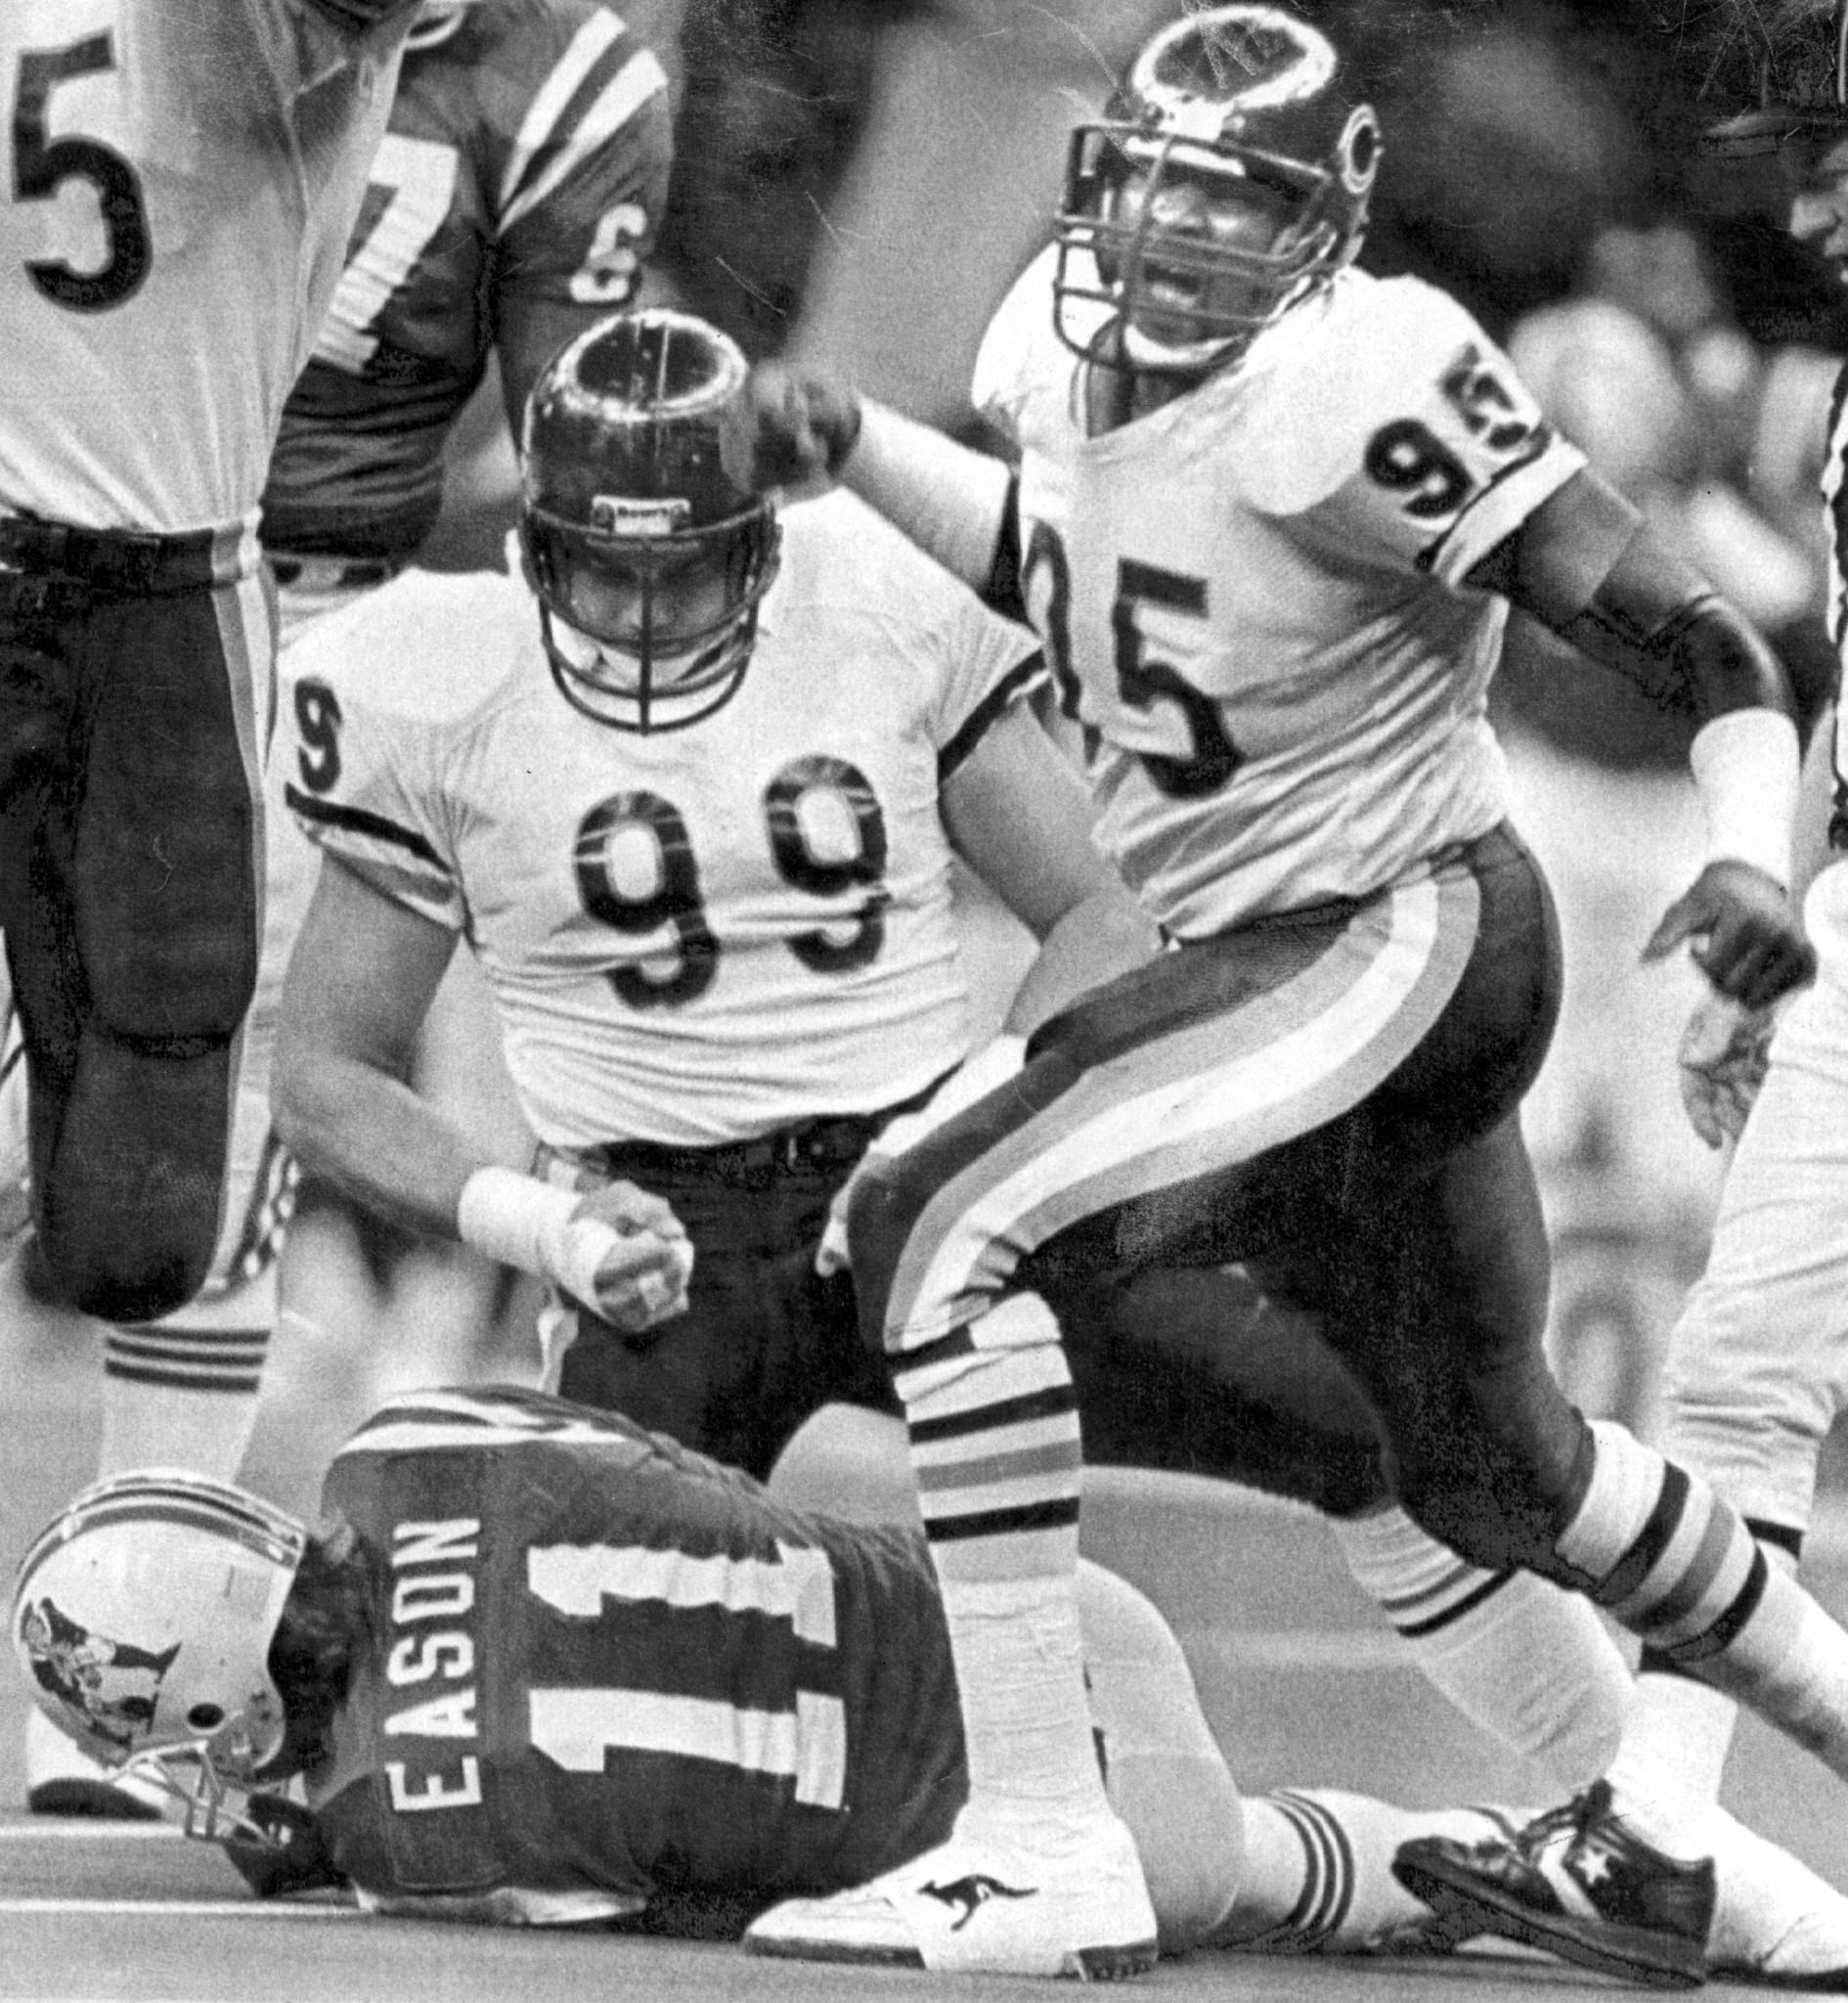 Dan Hampton and Richard Dent during Super Bowl XX.